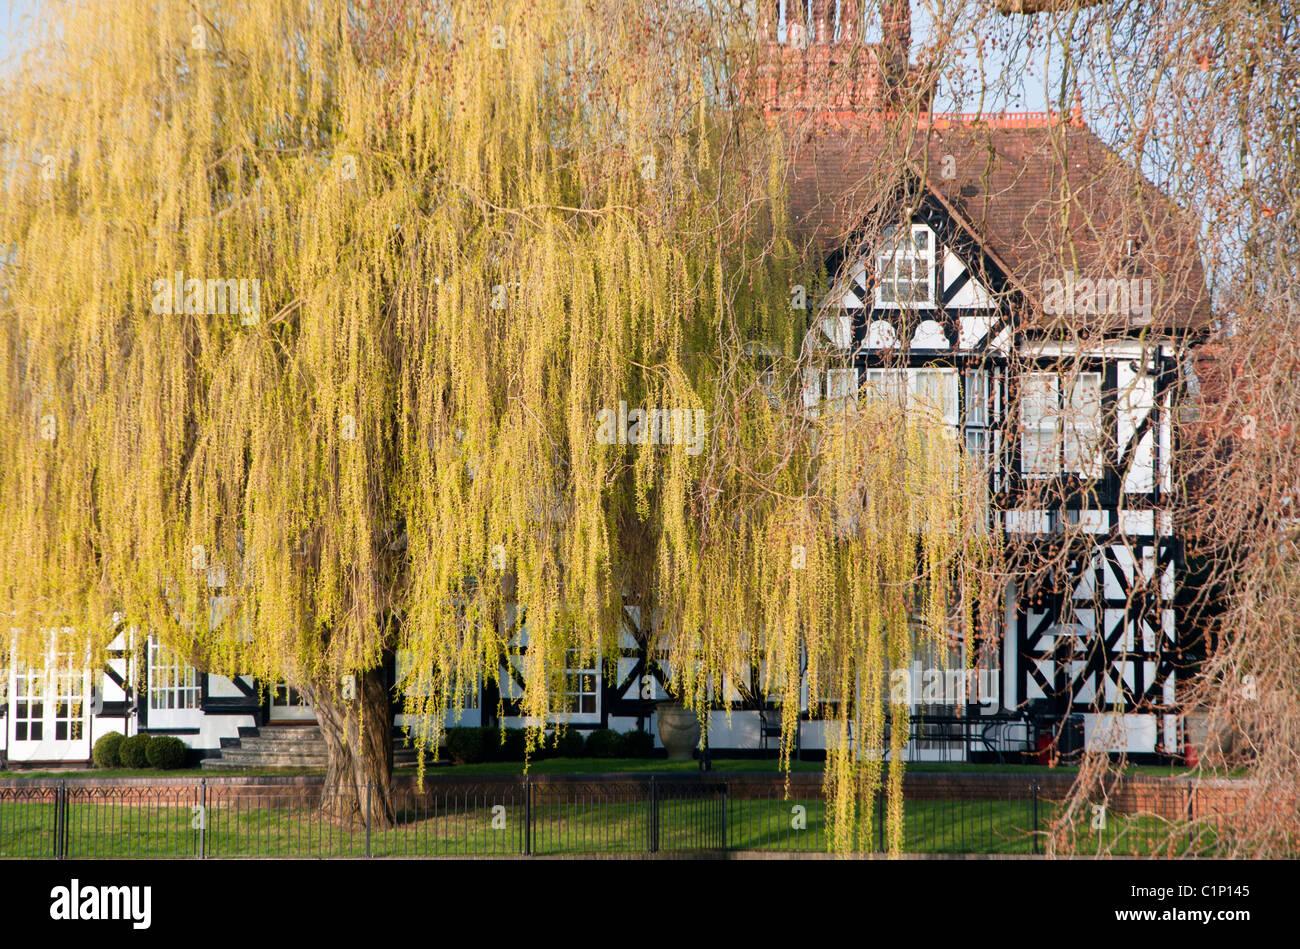 A mock Tudor house on the river Thames at Maidenhead. England. - Stock Image